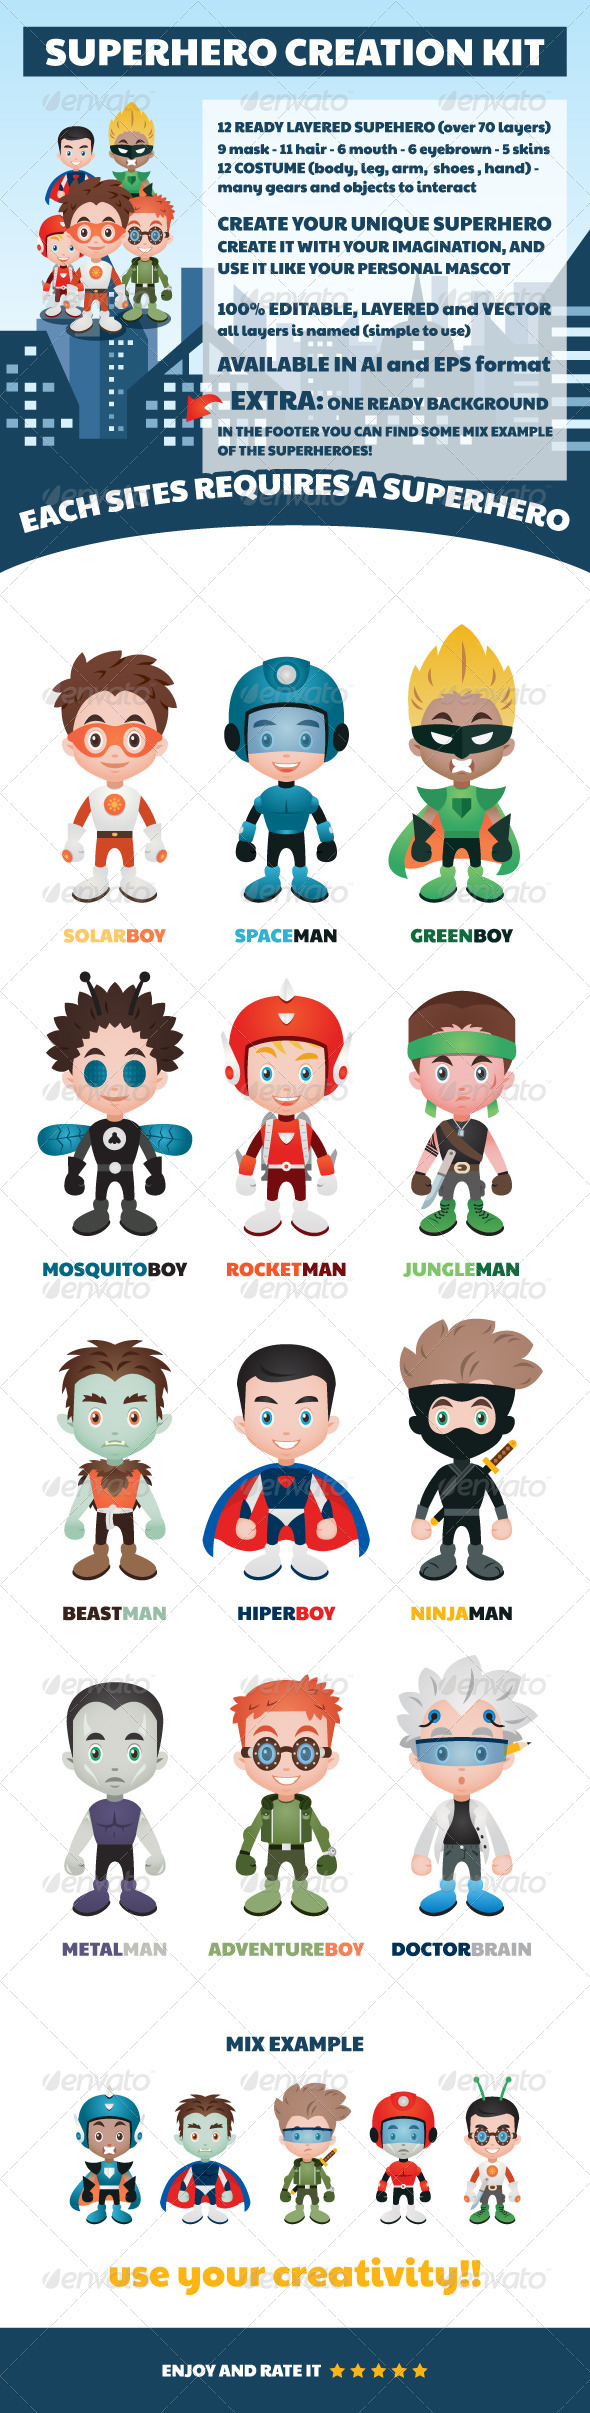 GraphicRiver Superhero Creation Kit 7797665